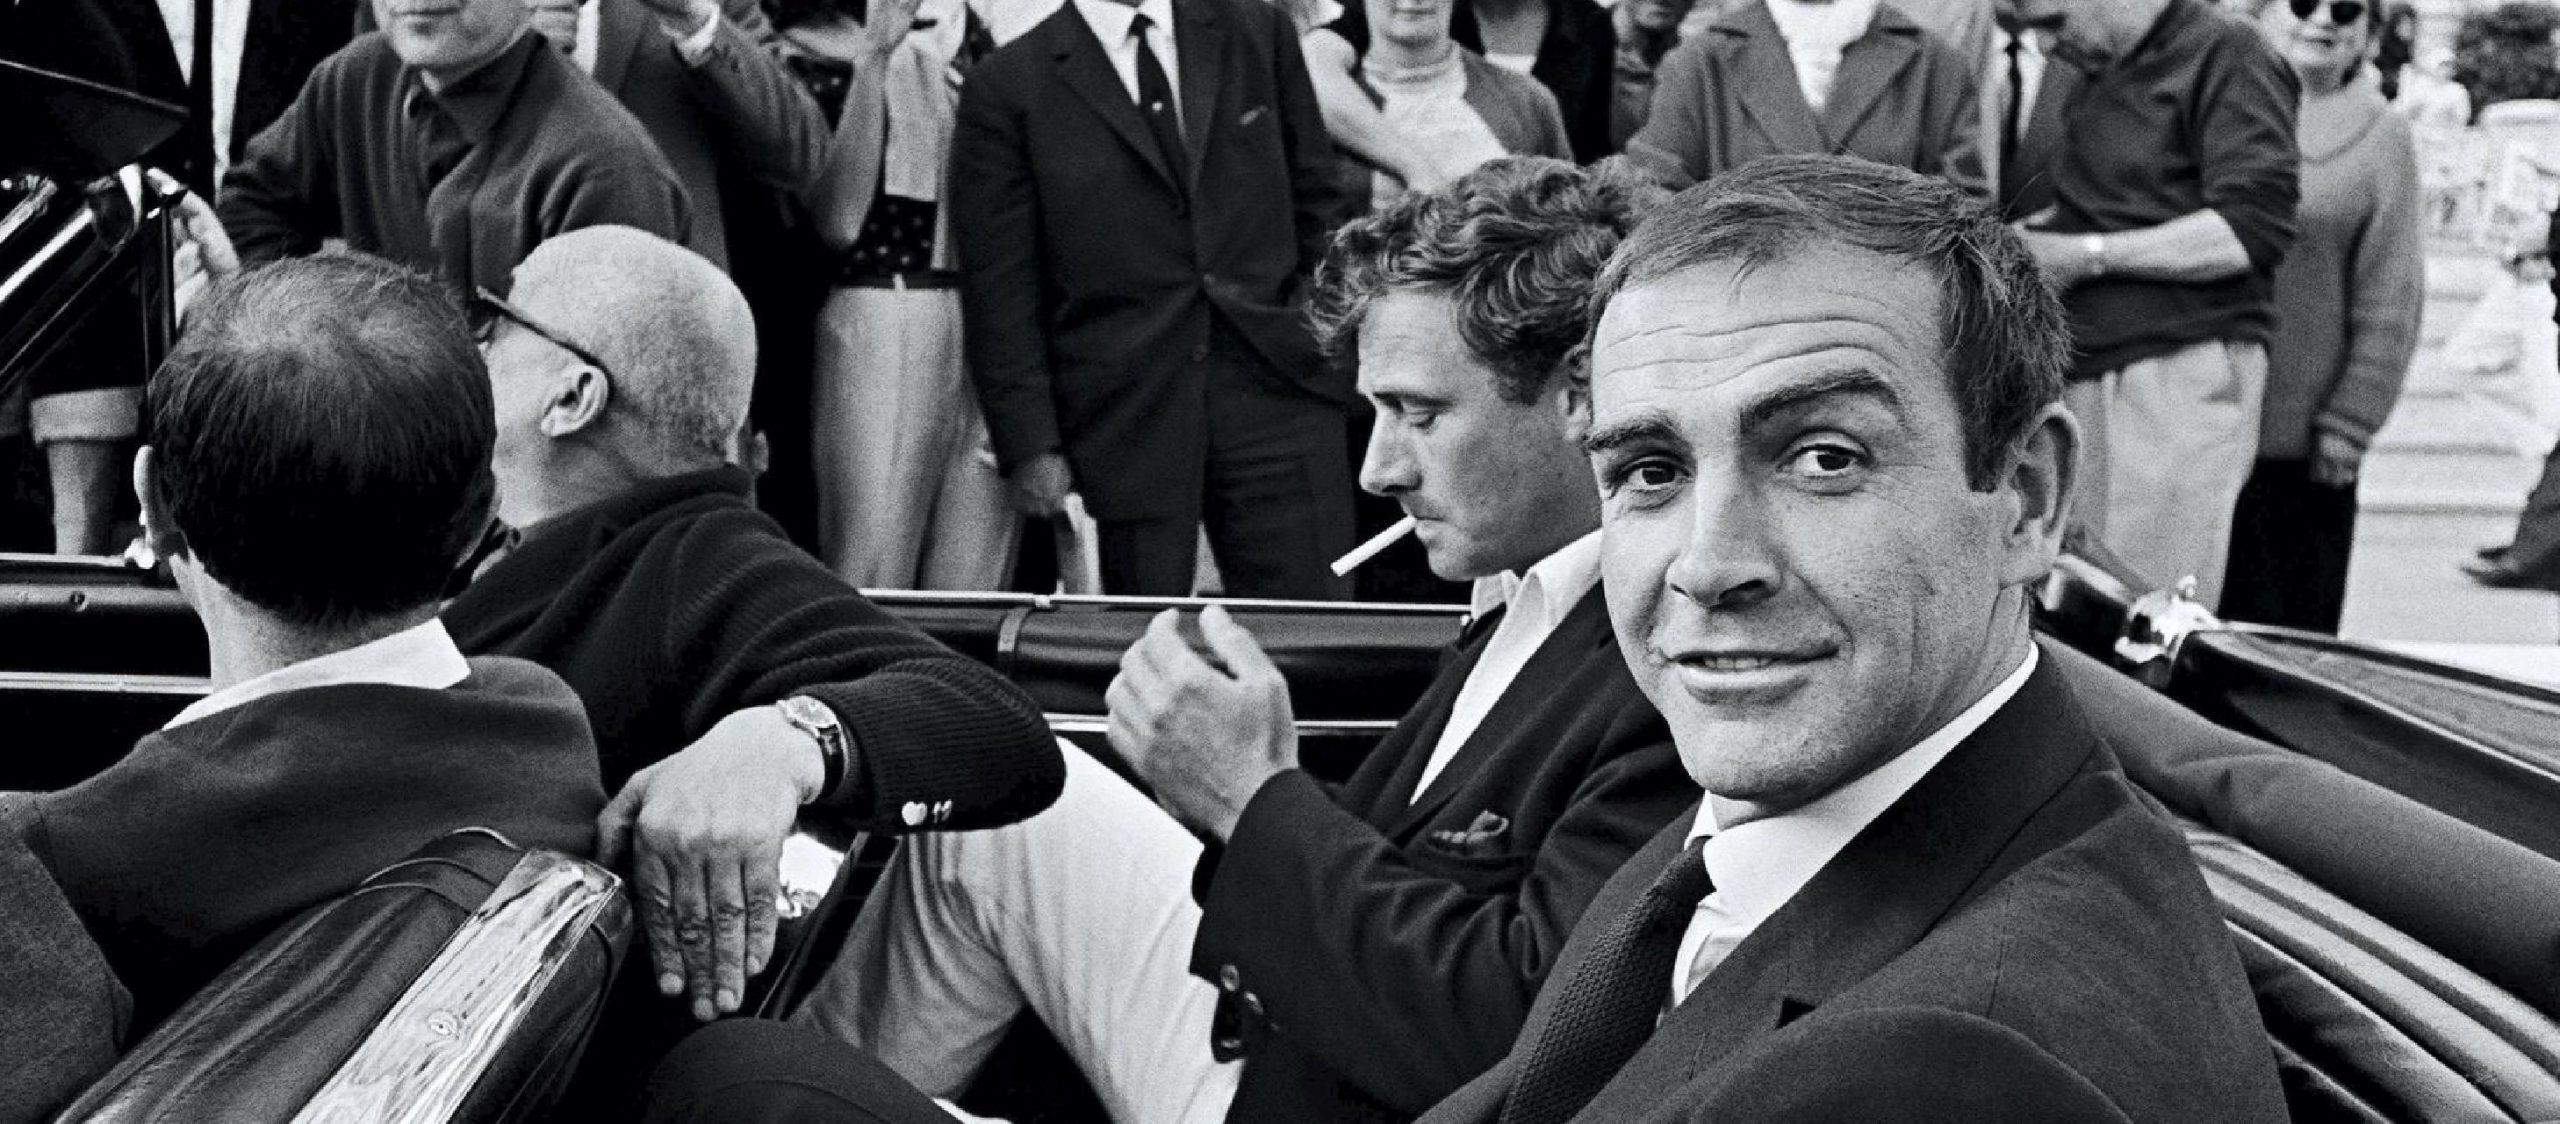 Scottish actor Sir Sean Connery dies at 90